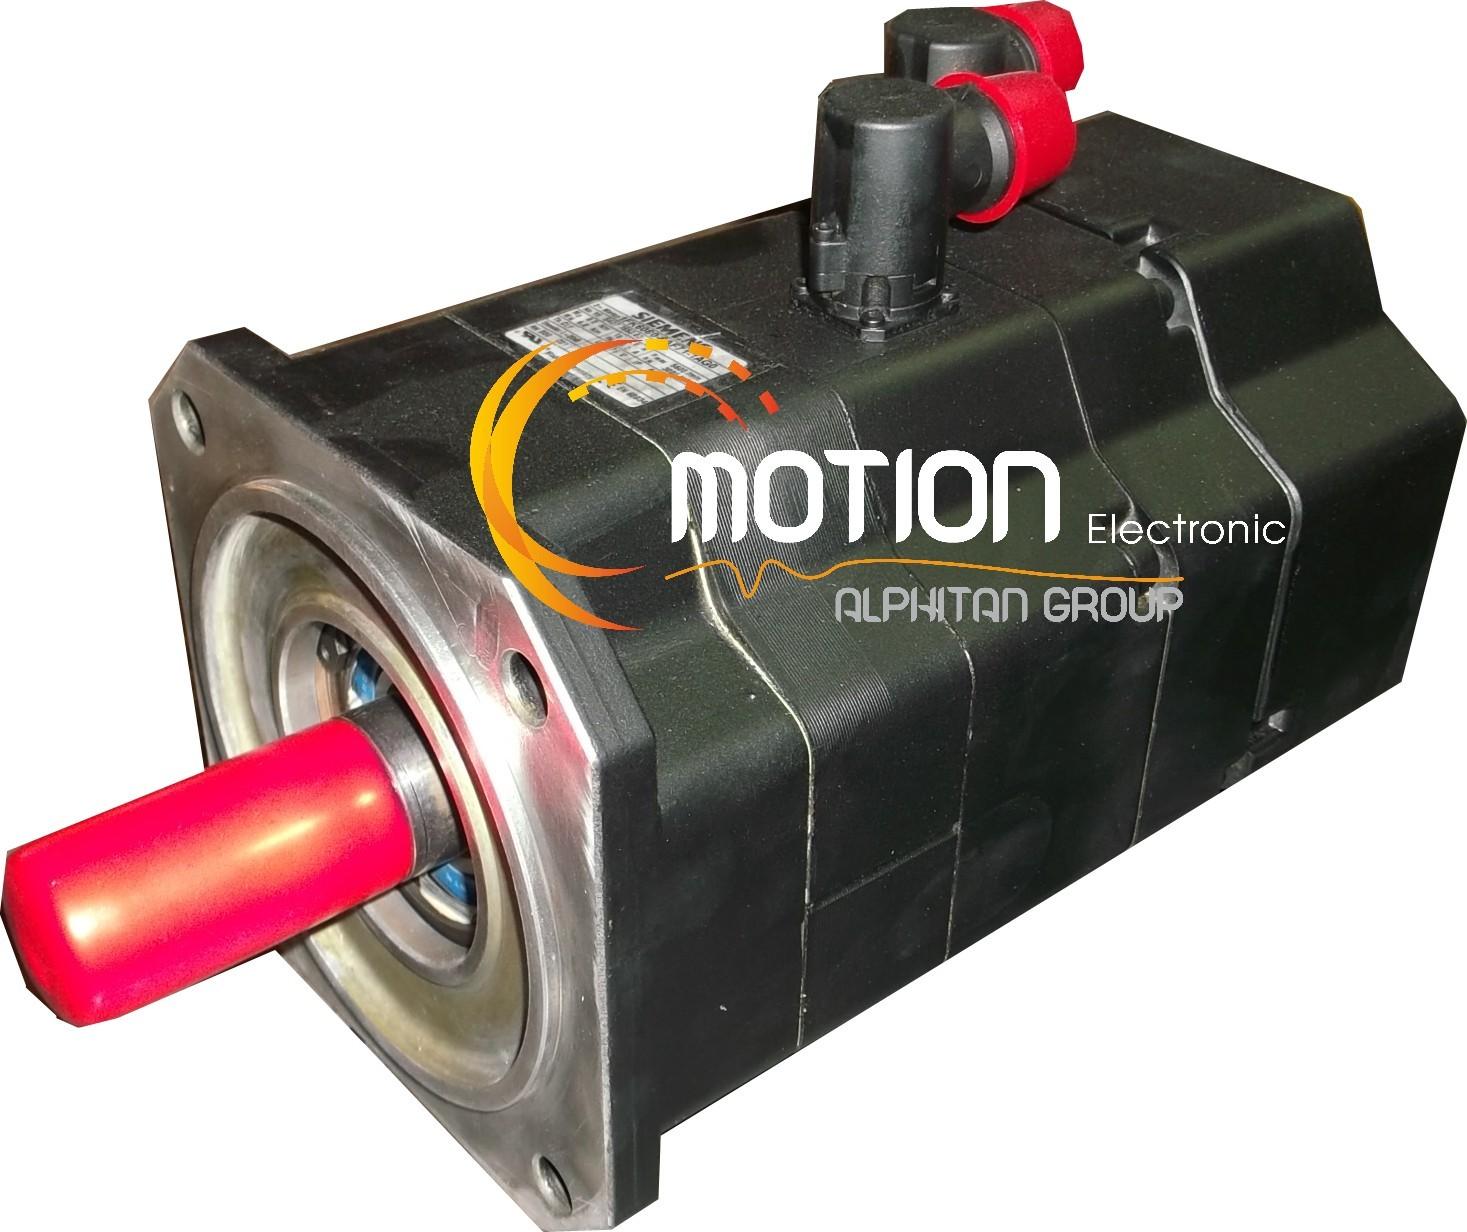 Siemens 1fk6080 6af71 1ag0 motor for Siemens electric motors catalog